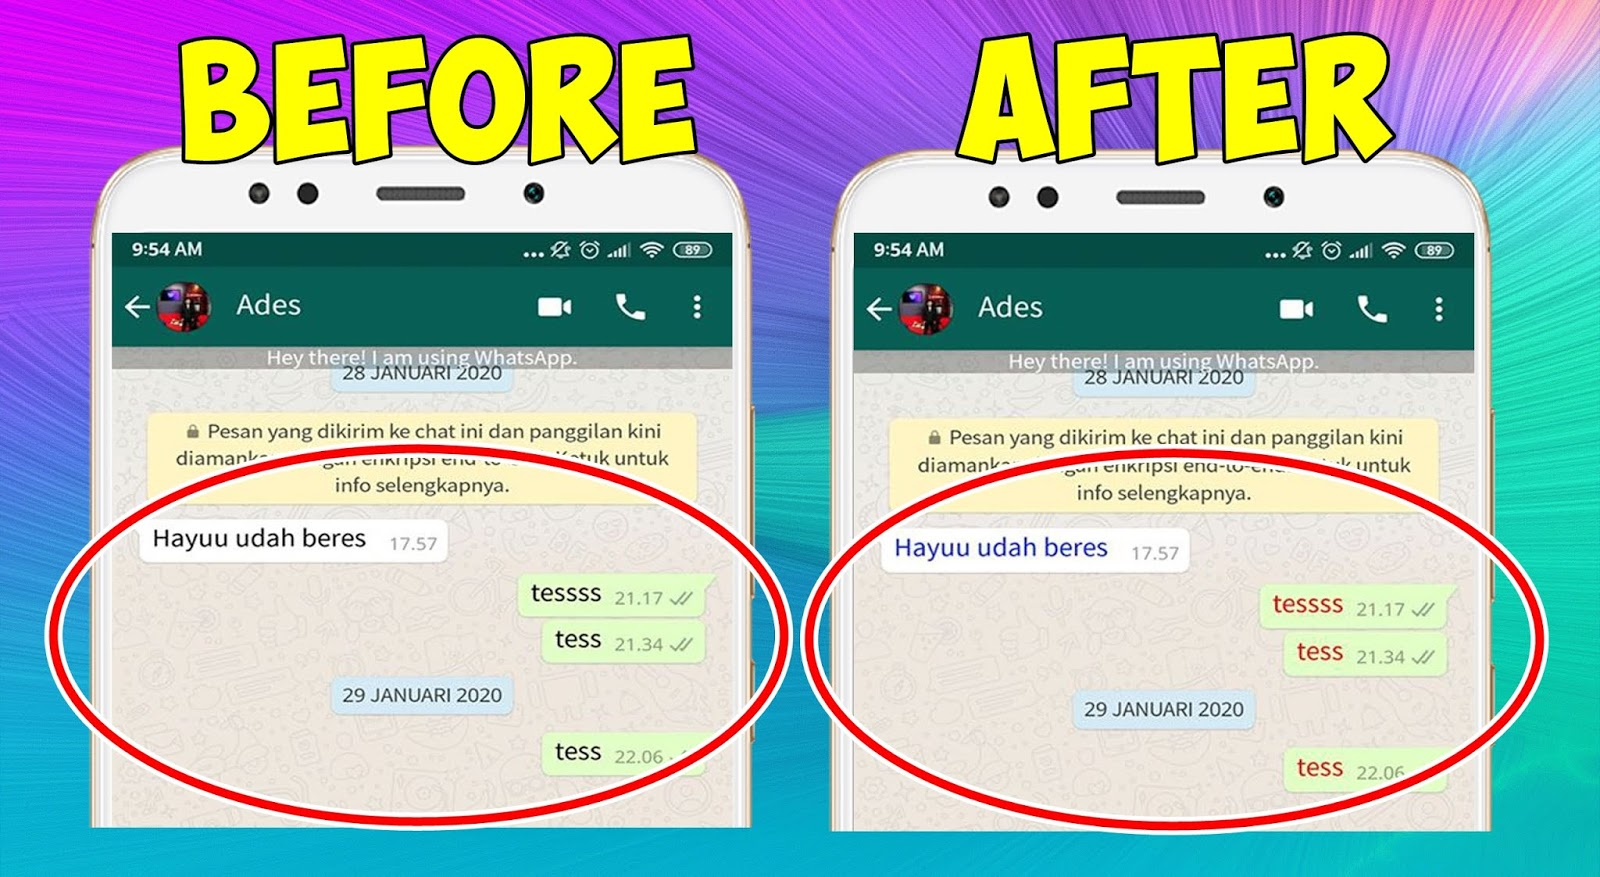 Cara Merubah Warna Font Chat Whatsapp Tanpa Aplikasi Tambahan Rumah Multimedia